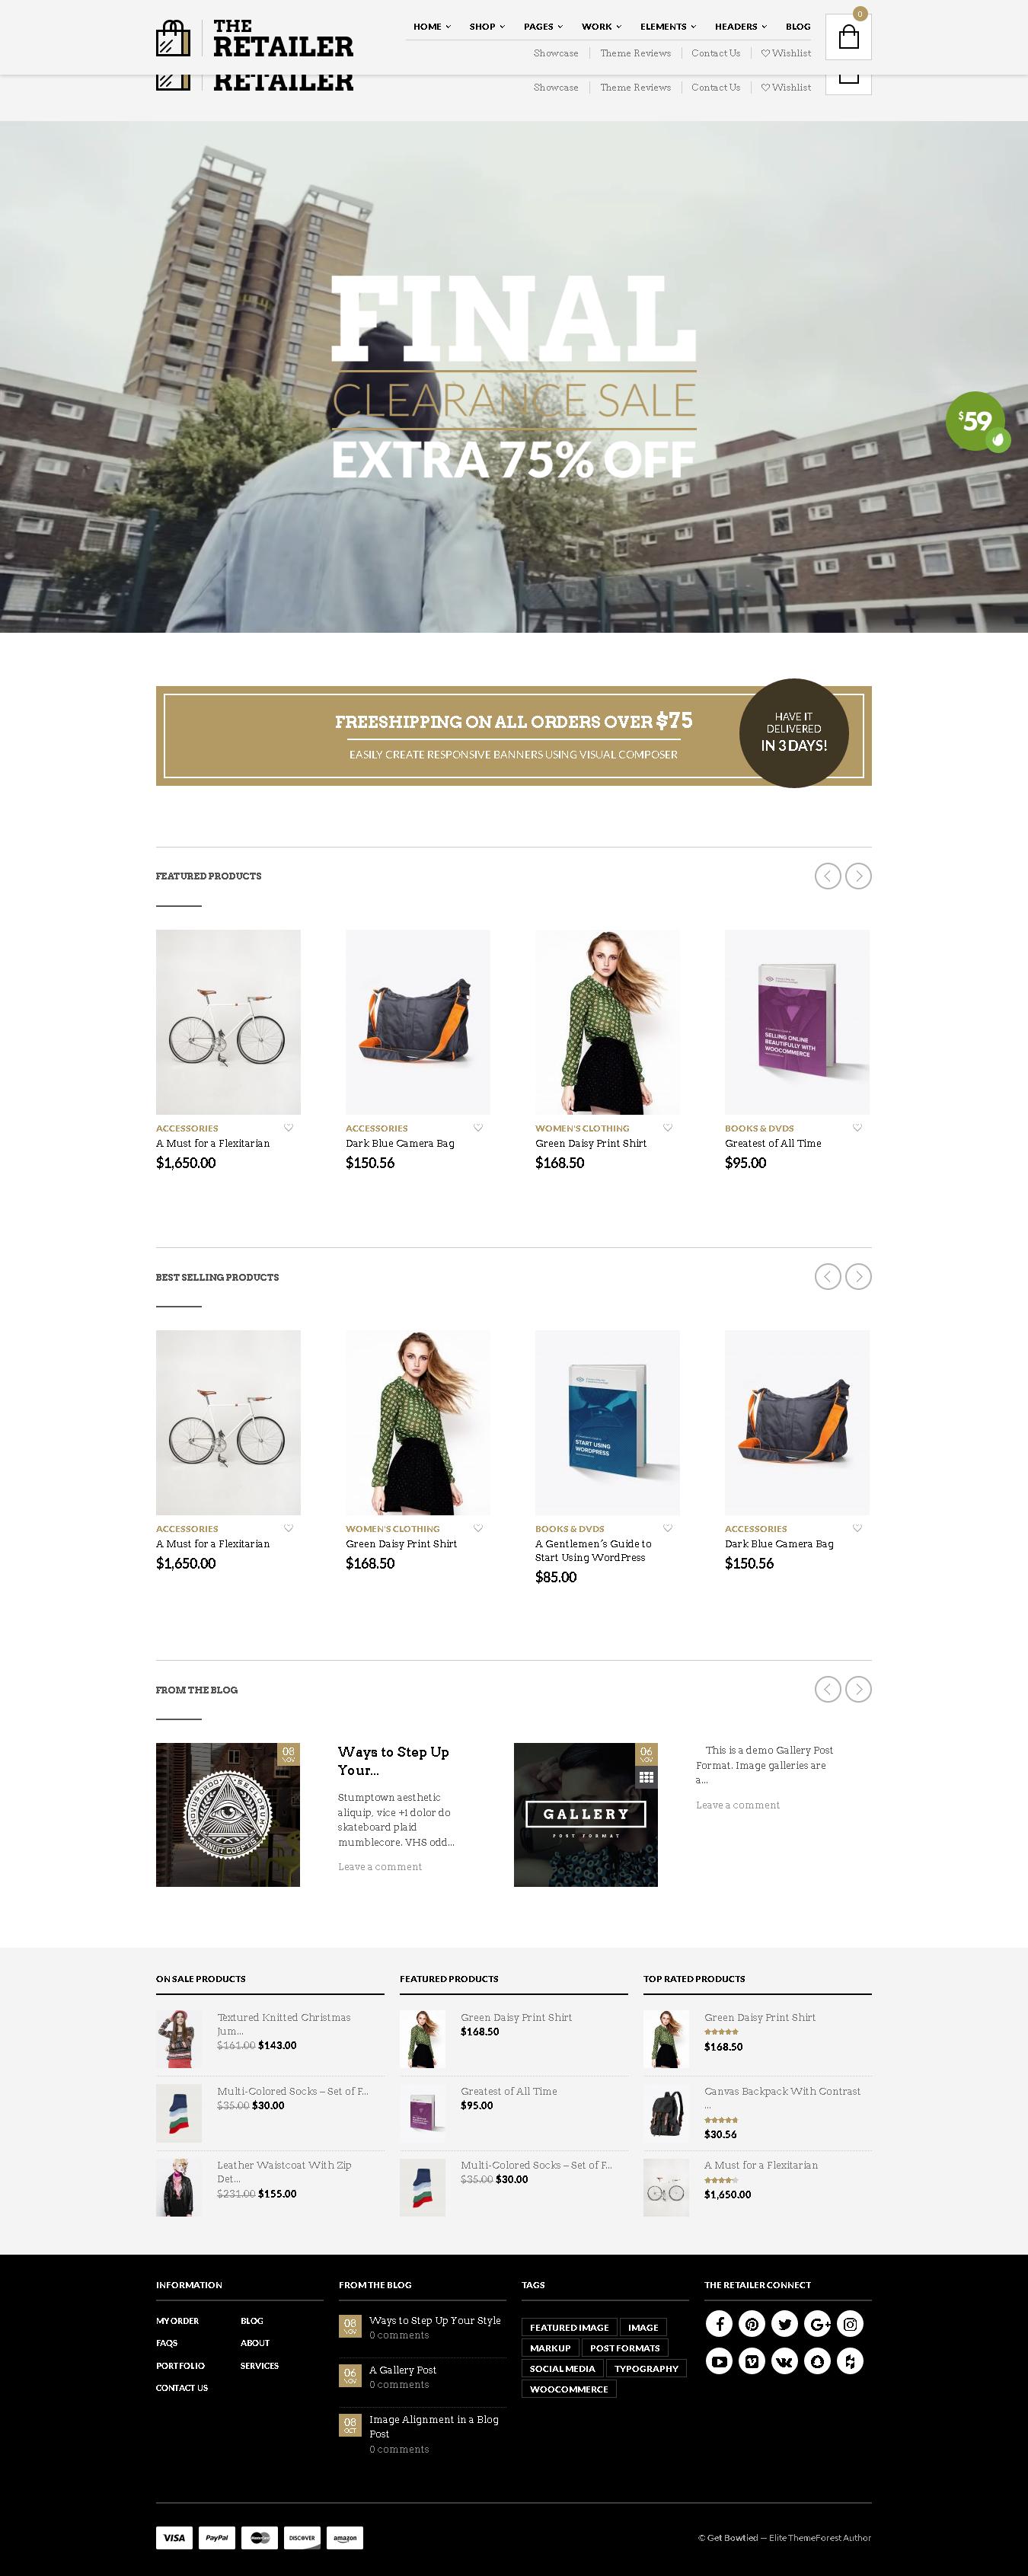 List of Top 5 WordPress WooCommerce themes for Art Studio Store - The Retailer - Responsive WordPress Theme